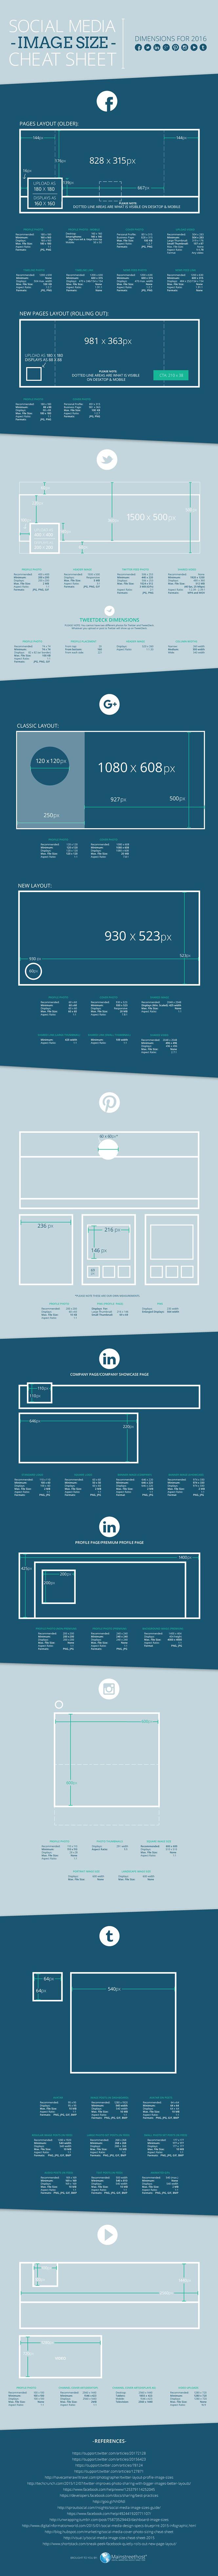 social-cheat-sheet-infographic